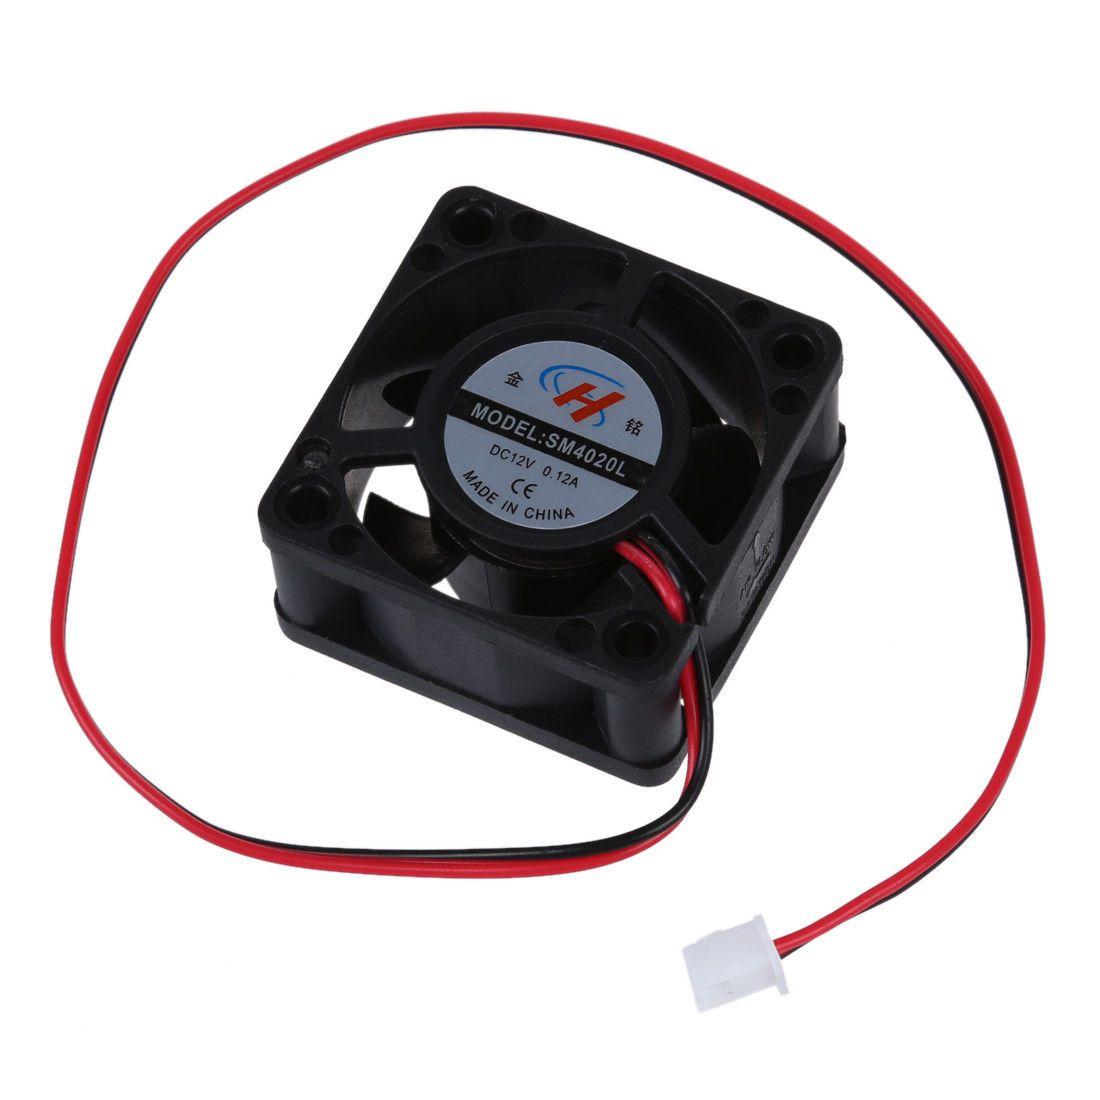 medium resolution of  1 58 aud black plastic 12v dc 40mm 20mm 2 wire computer pc cpu cooling case fan v9b6 ebay electronics